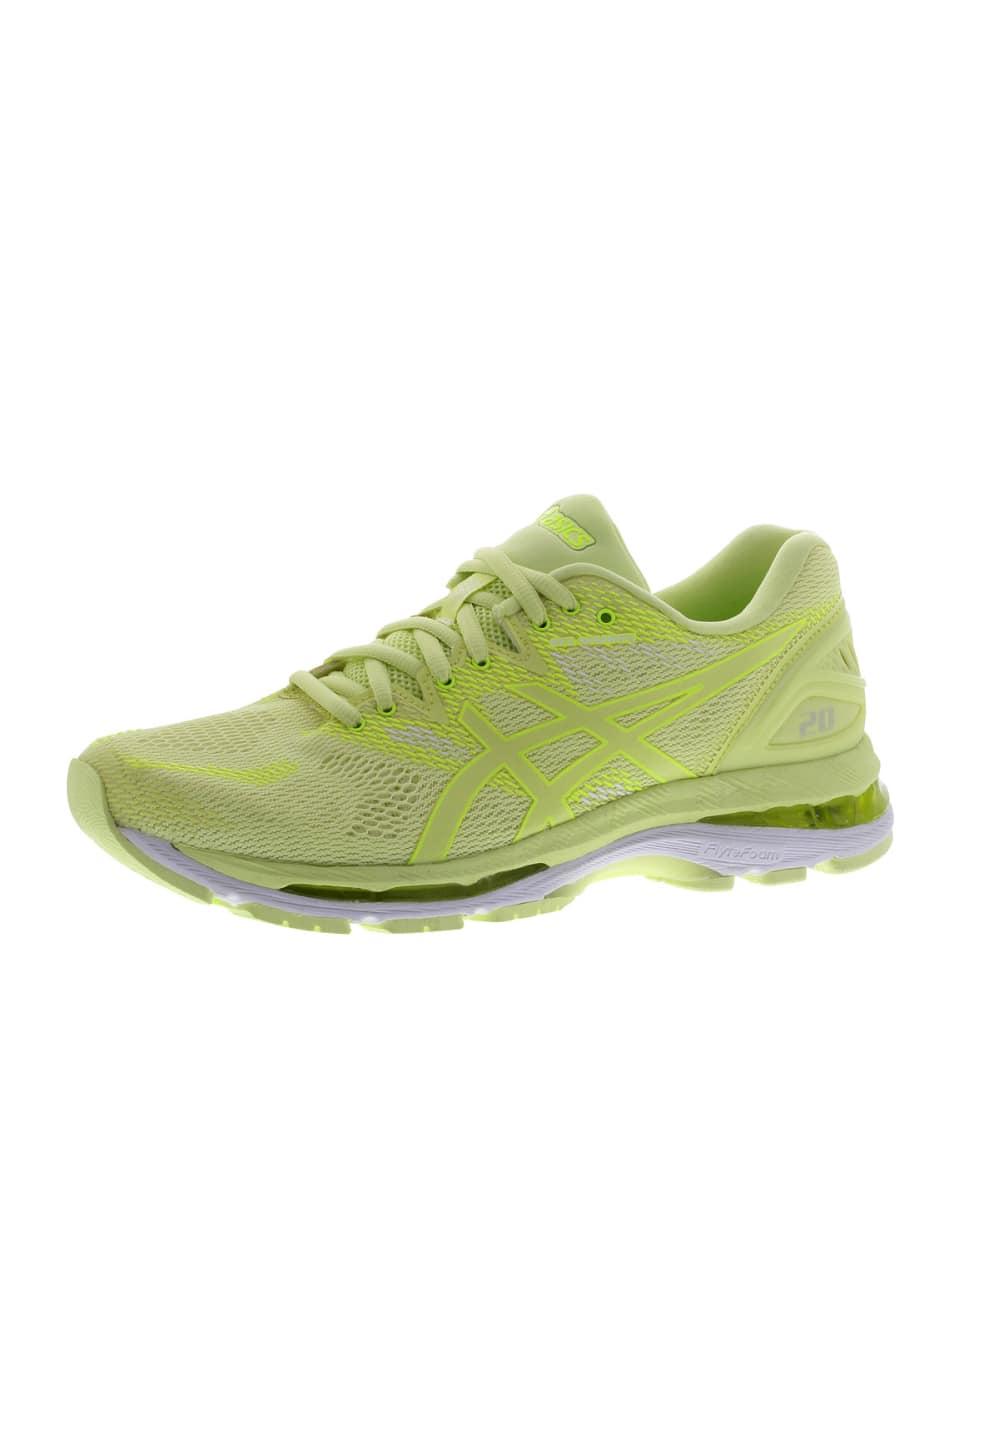 b9c7830836b50b Asics Chaussures Nimbus Gel Running Femme Pour 21run 20 Beige nrnBPxR7